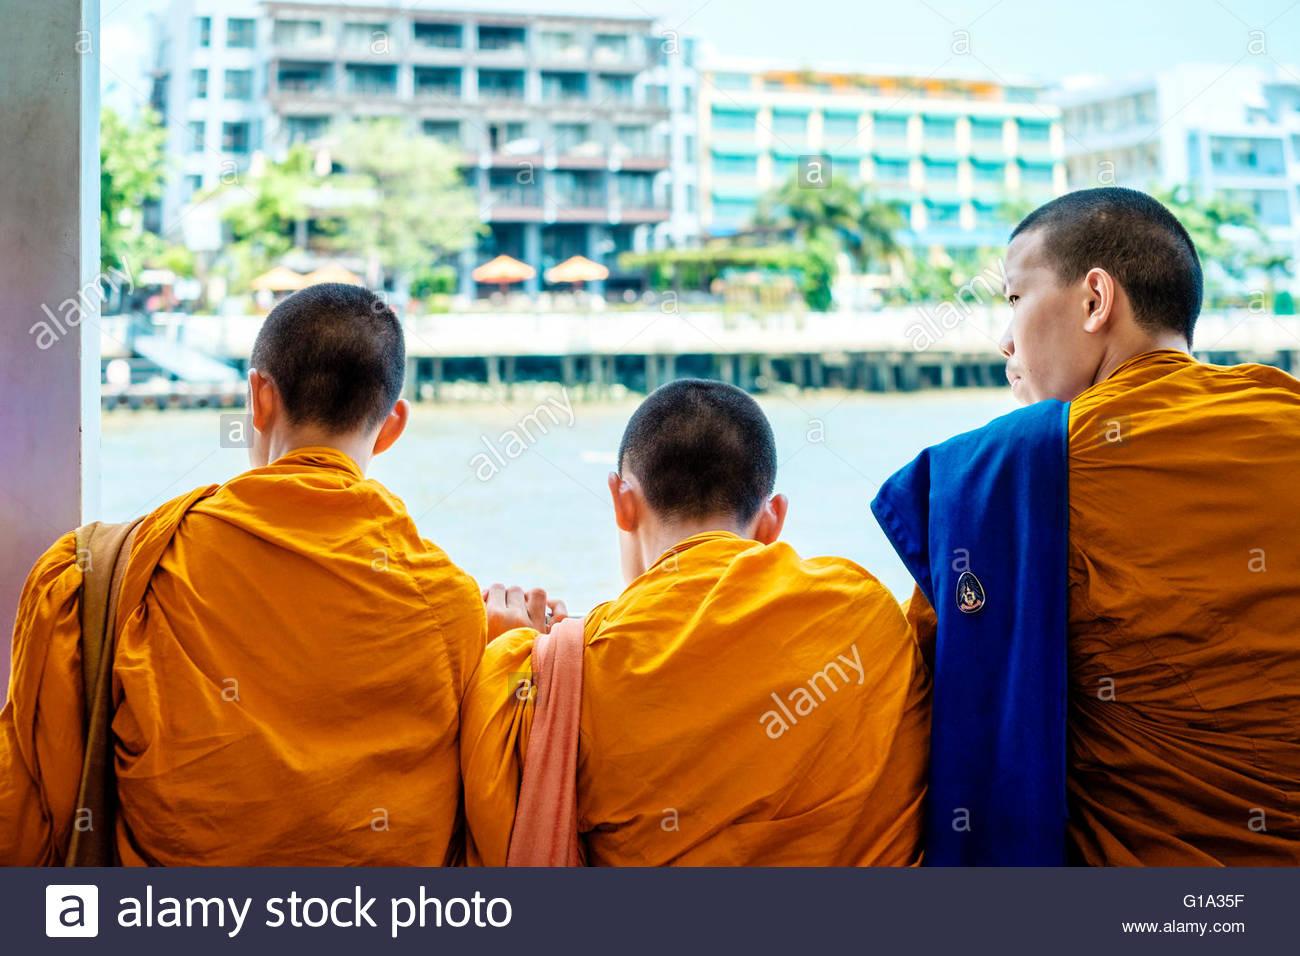 Three monks looking over the Chao Phraya River, Bangkok, Thailand - Stock Image